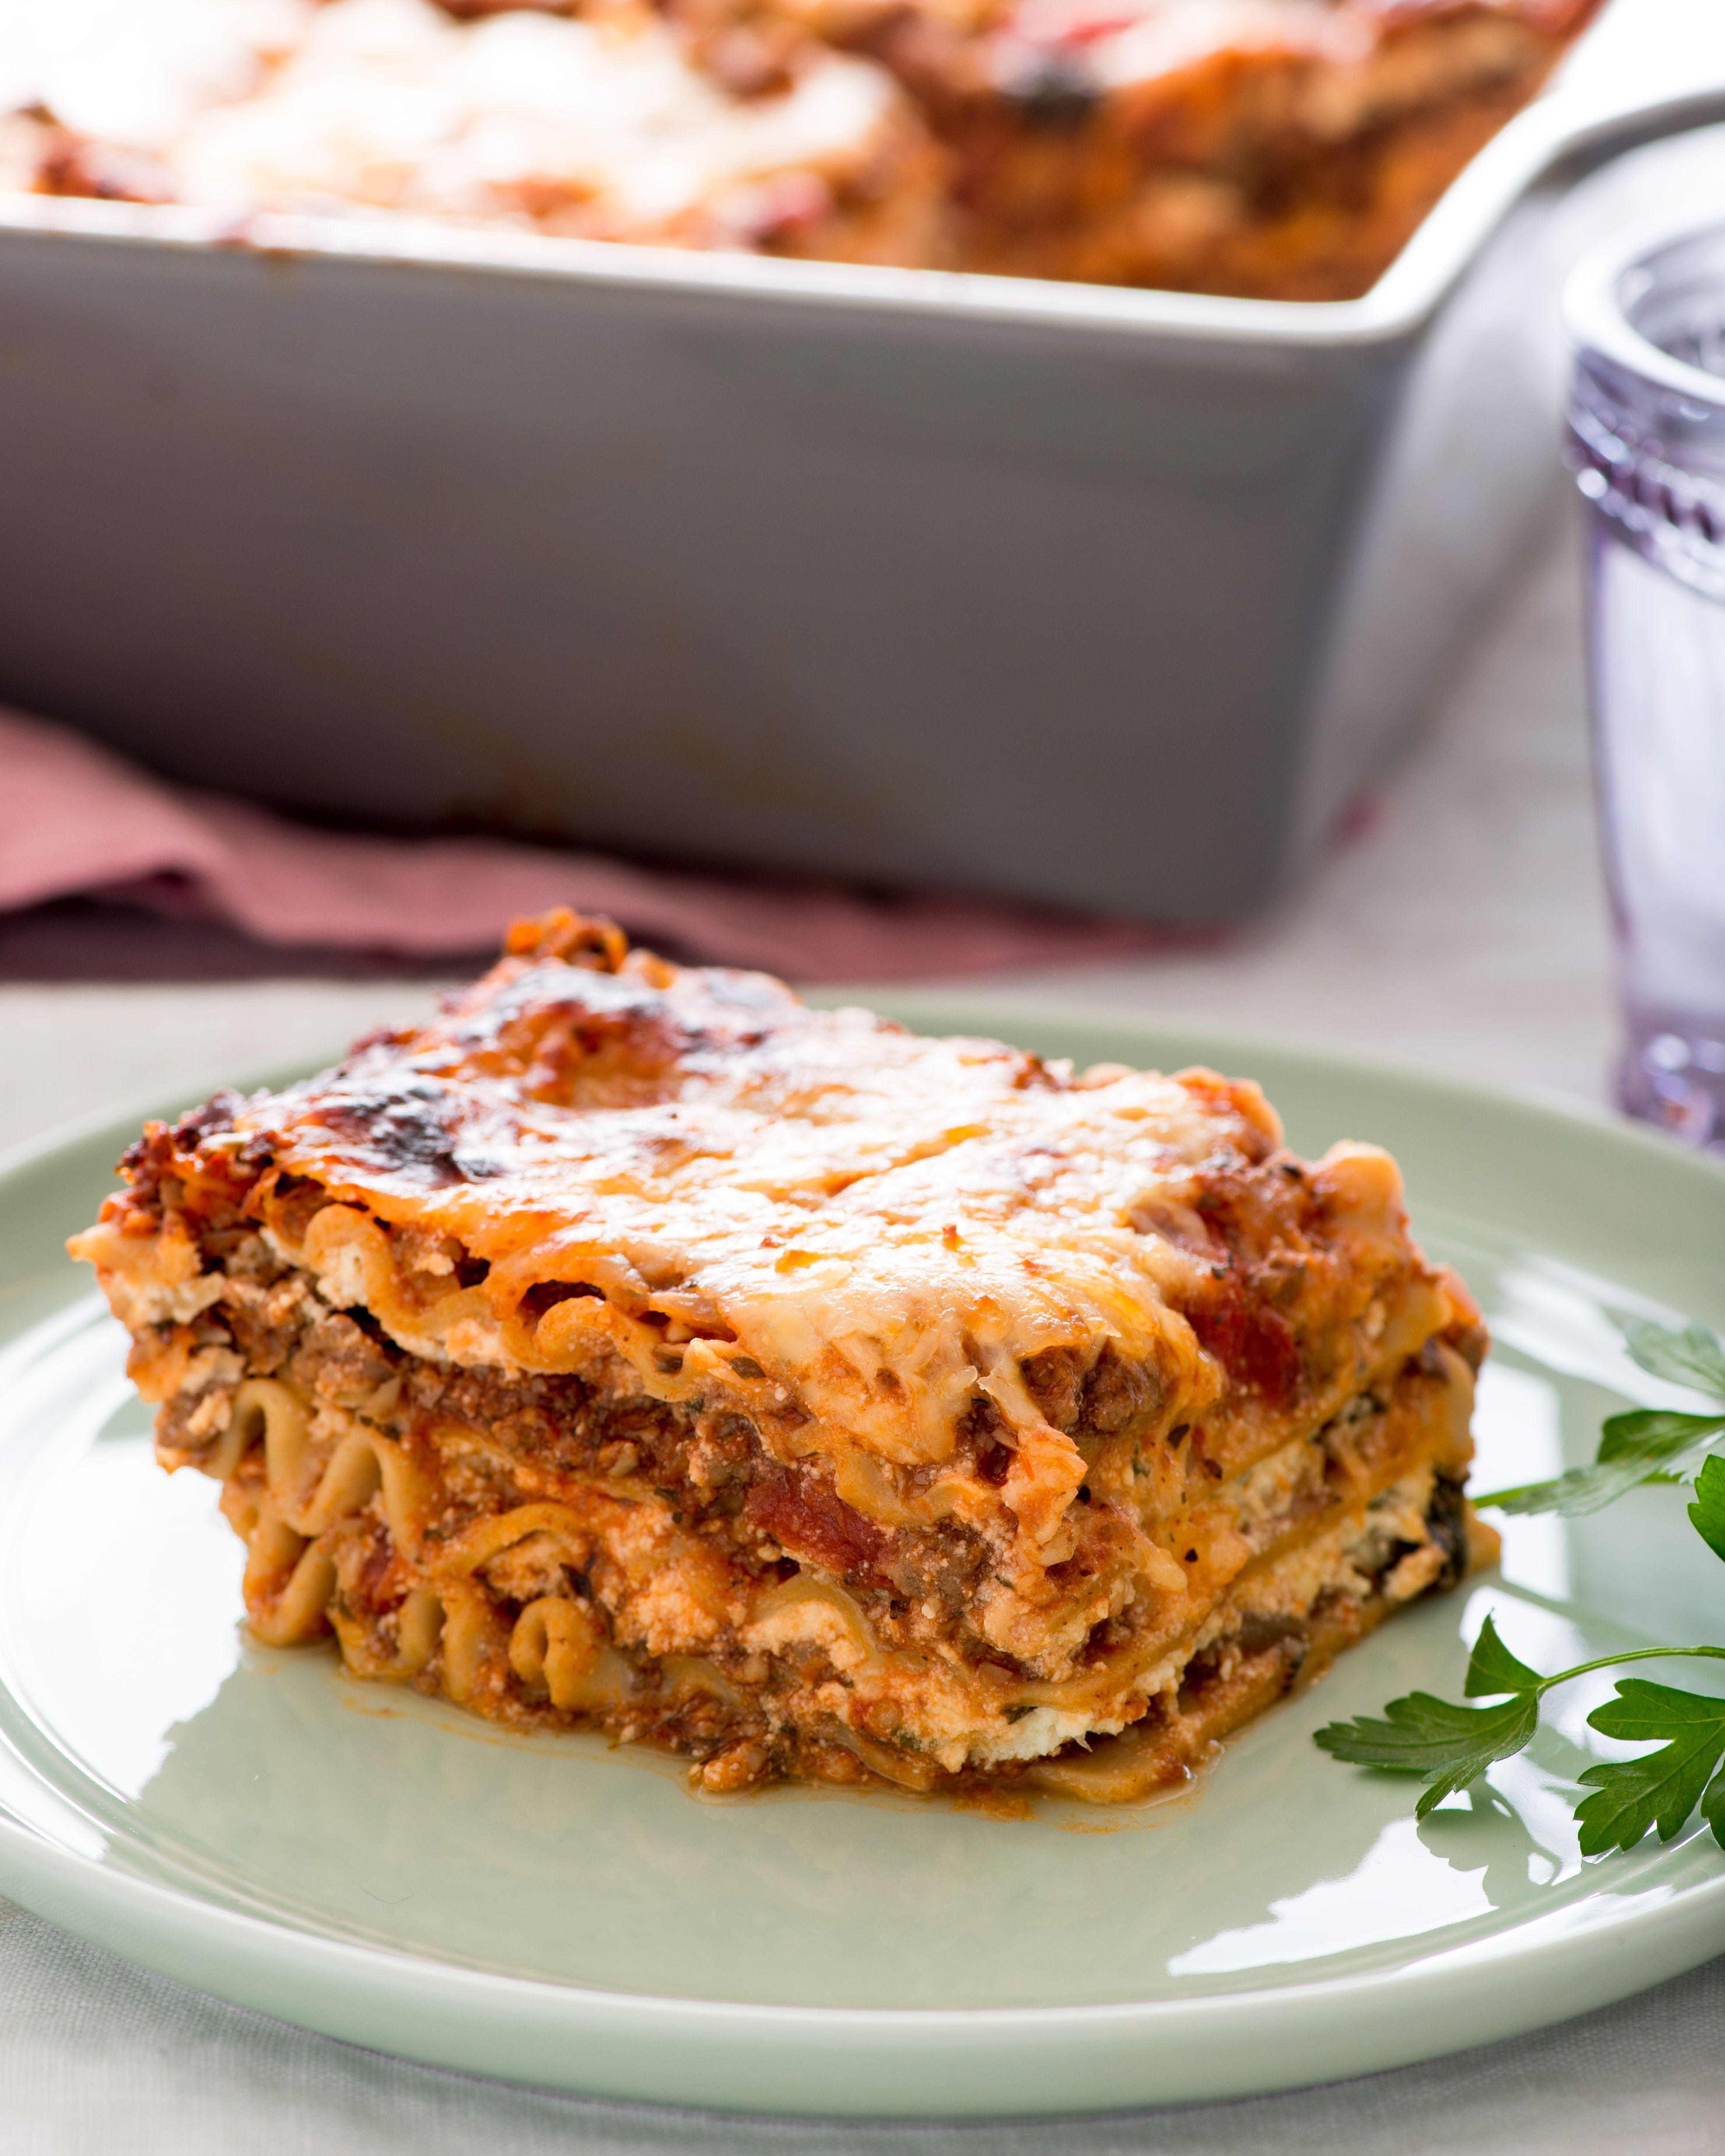 Recipe Meaty Mushroom Lasagna Recipe Recipes Mushroom Lasagna Stuffed Mushrooms